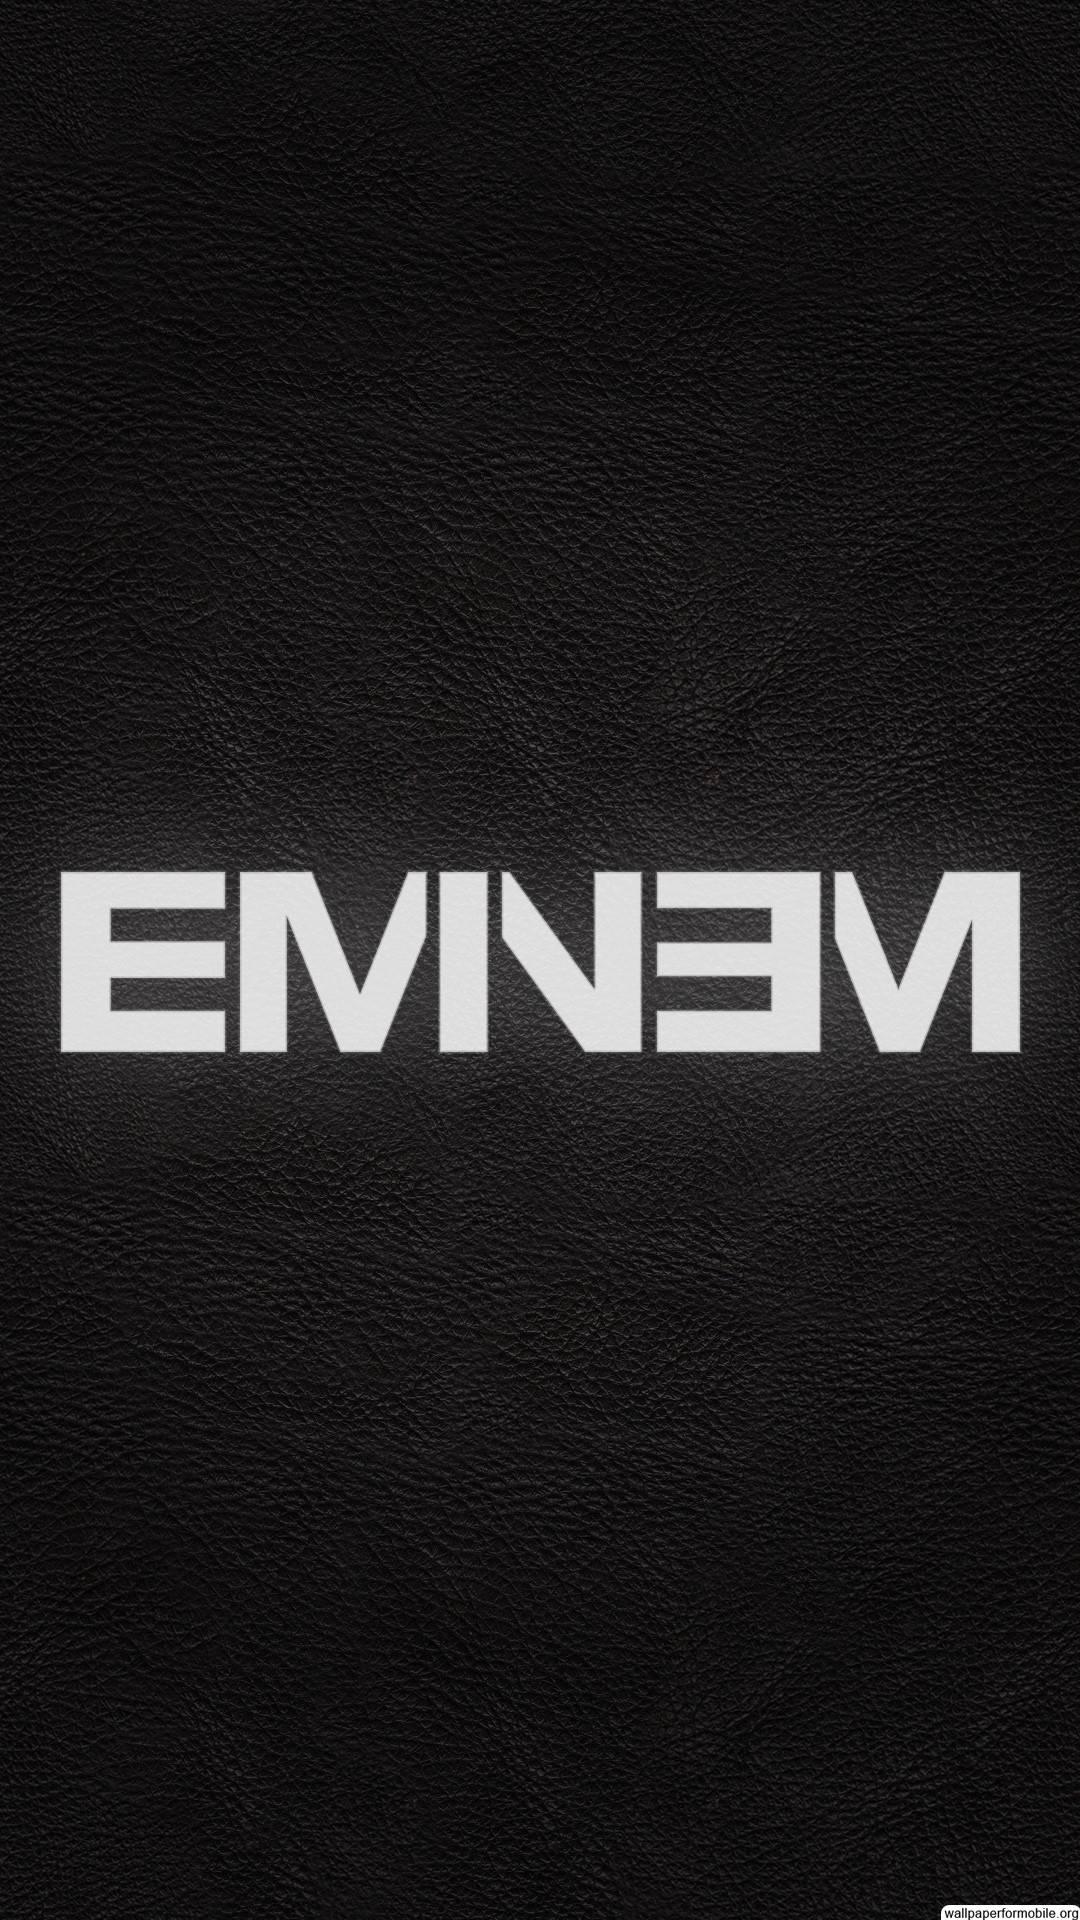 Eminem Logo Wallpapers Wallpaper Cave